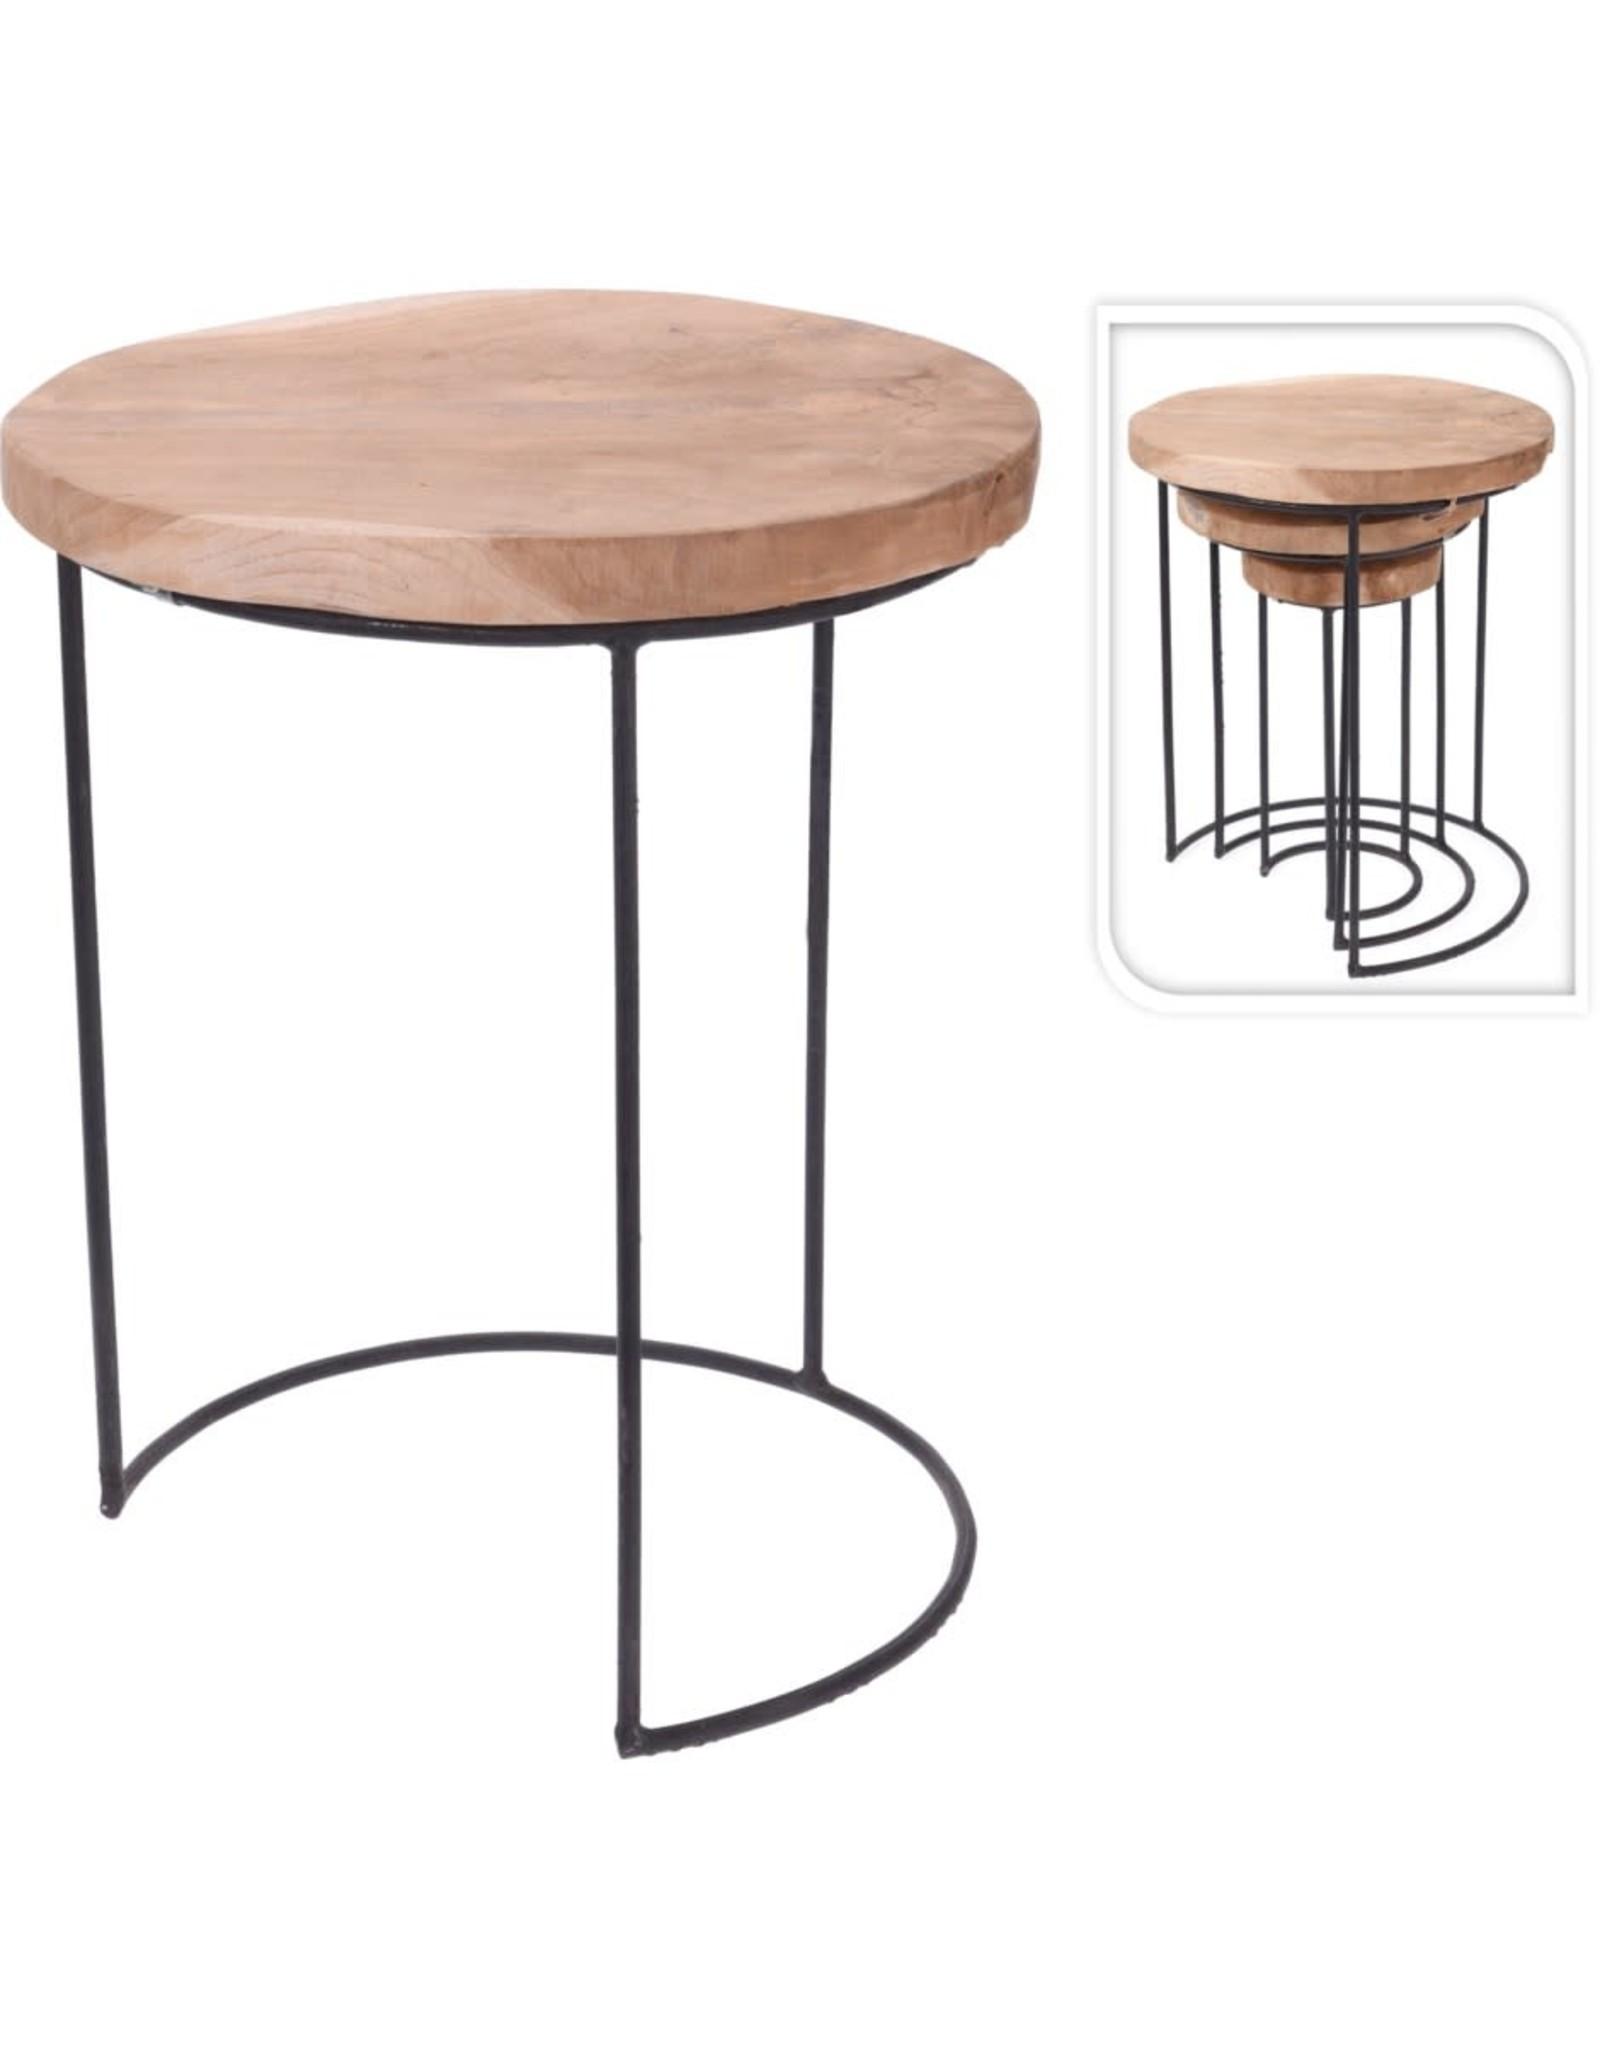 Tables d'appoint en teak